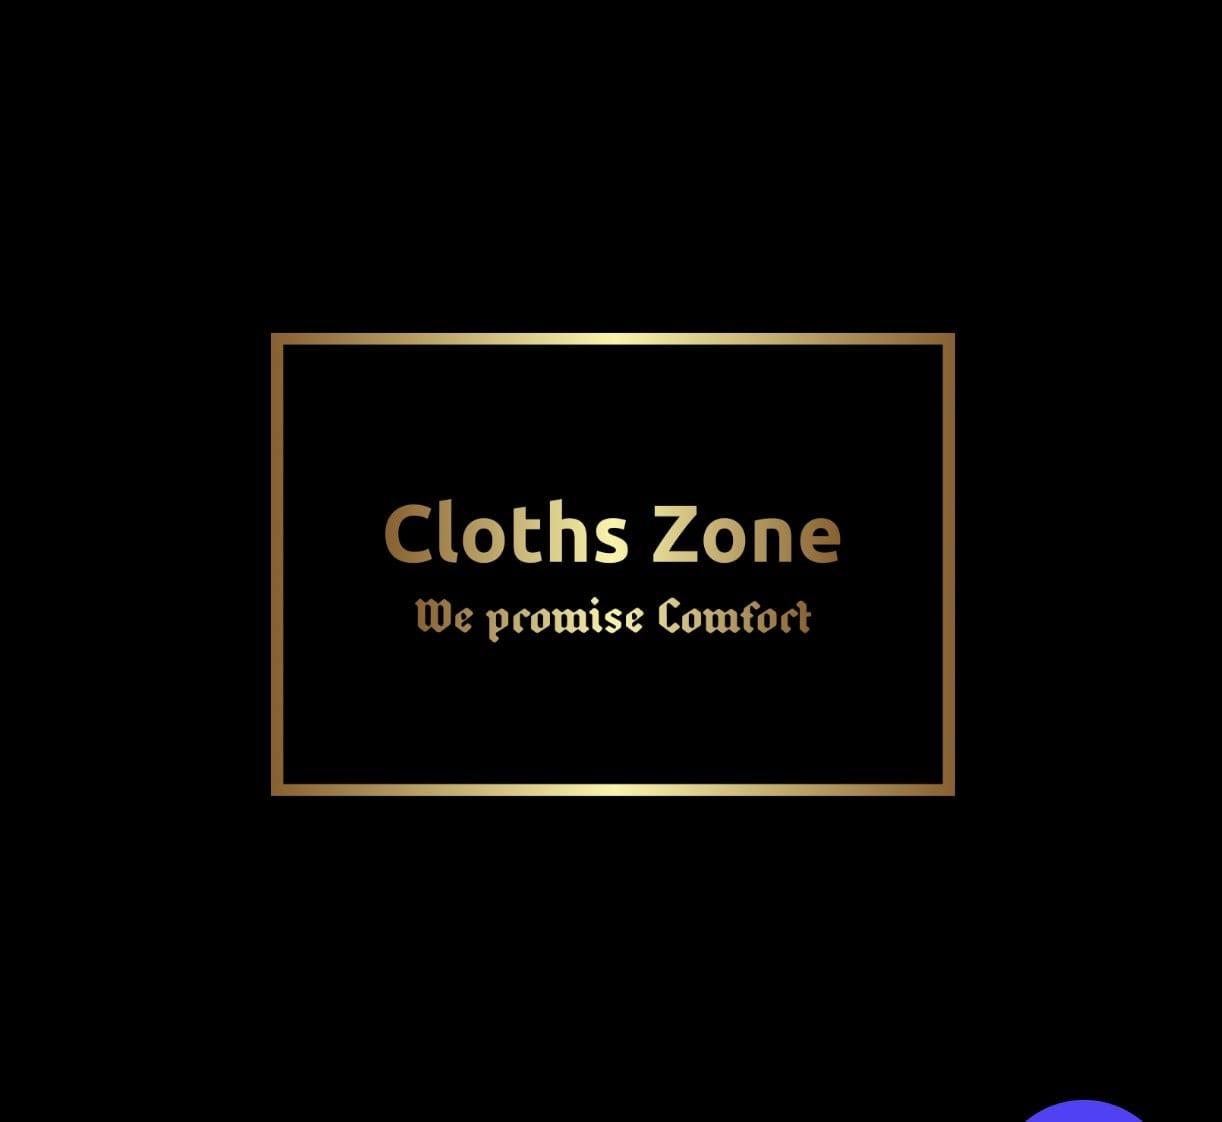 Cloths Zone